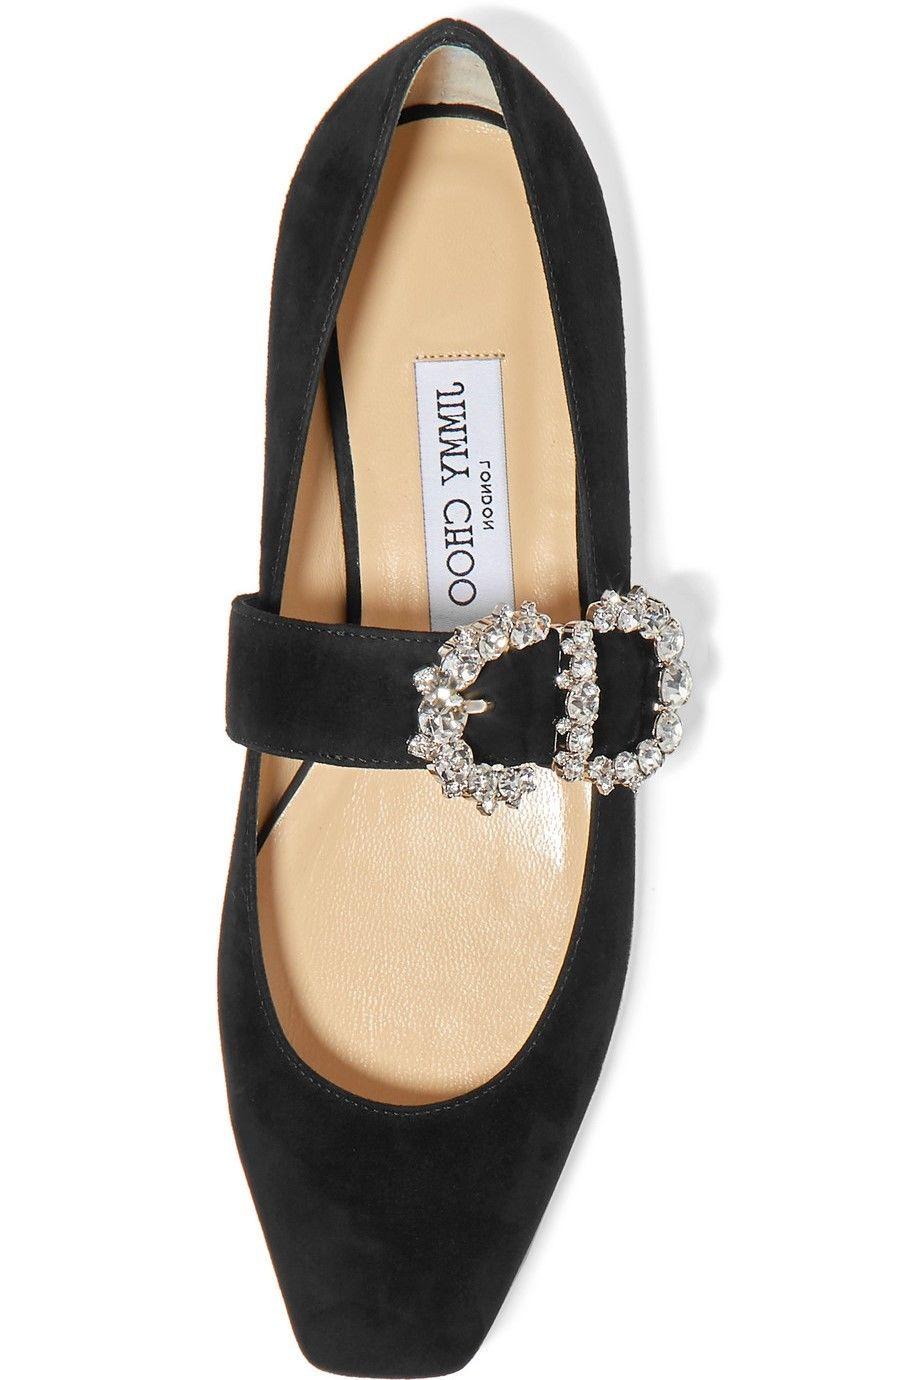 #PopbelaOOTD: Flat Shoes Cantik yang Nyaman untuk Sehari-hari